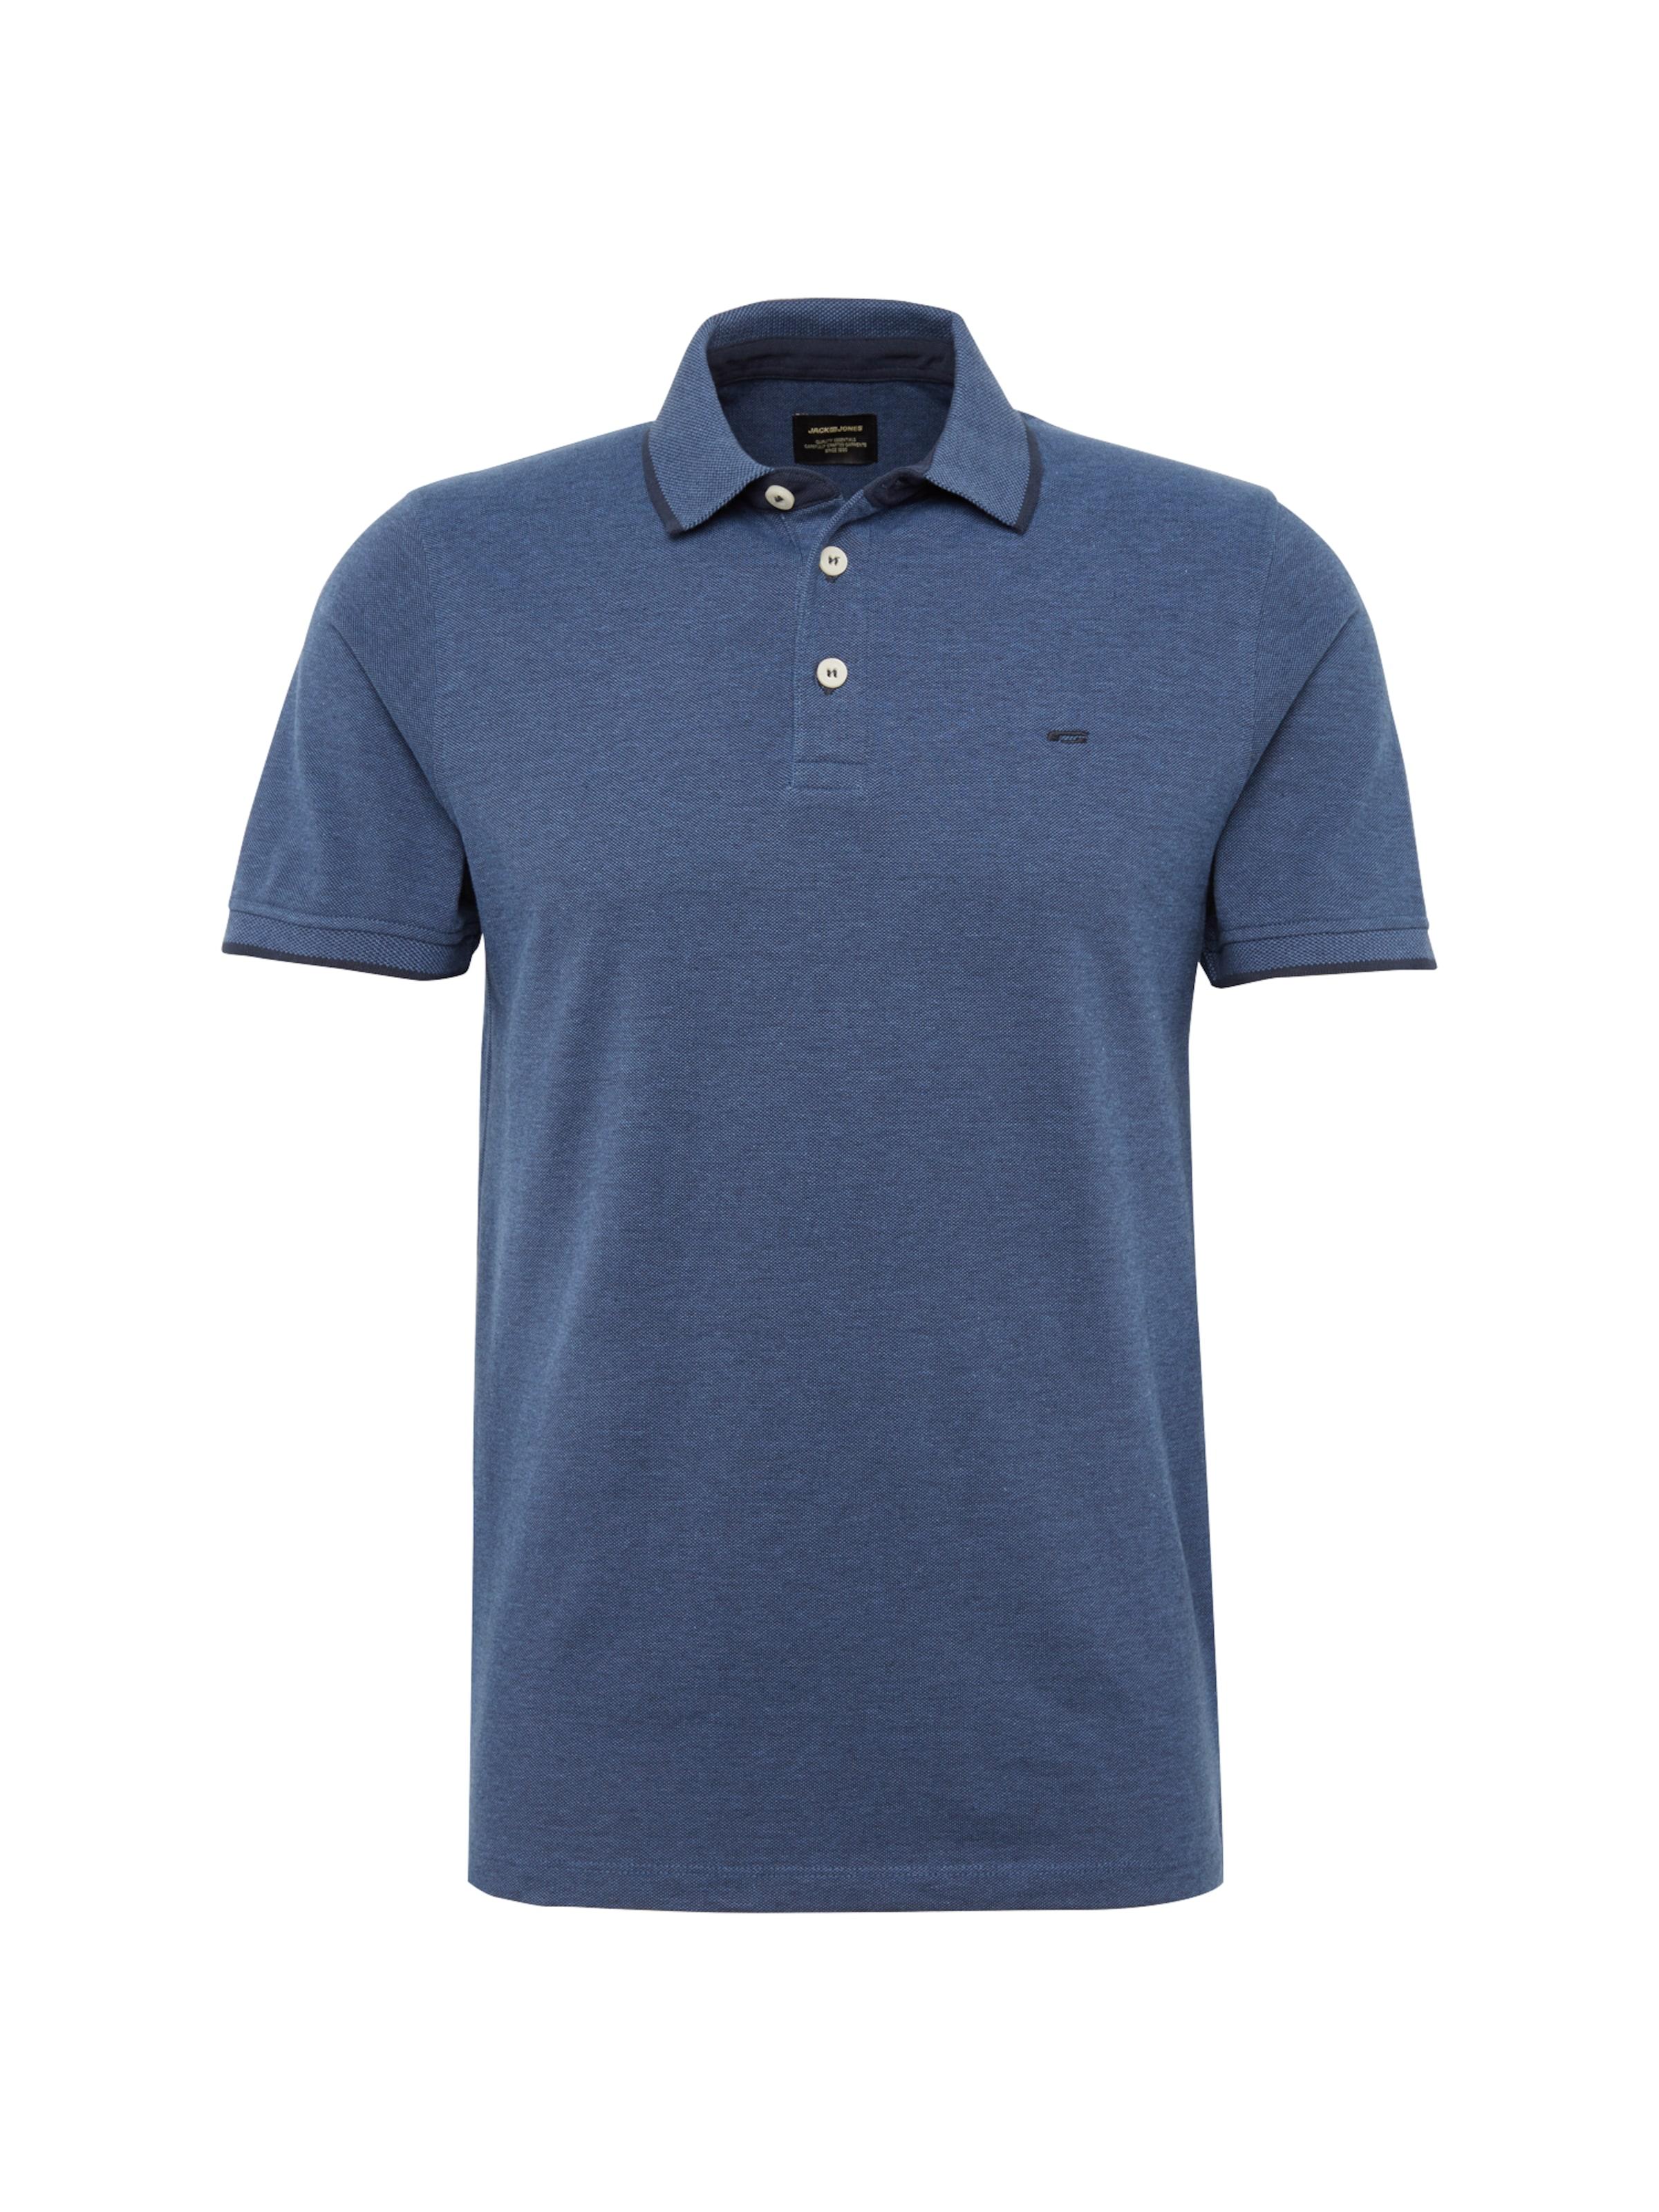 Bleu T Jones shirt Jack Marine En 'jjepaulos' amp; WYqCPFBw